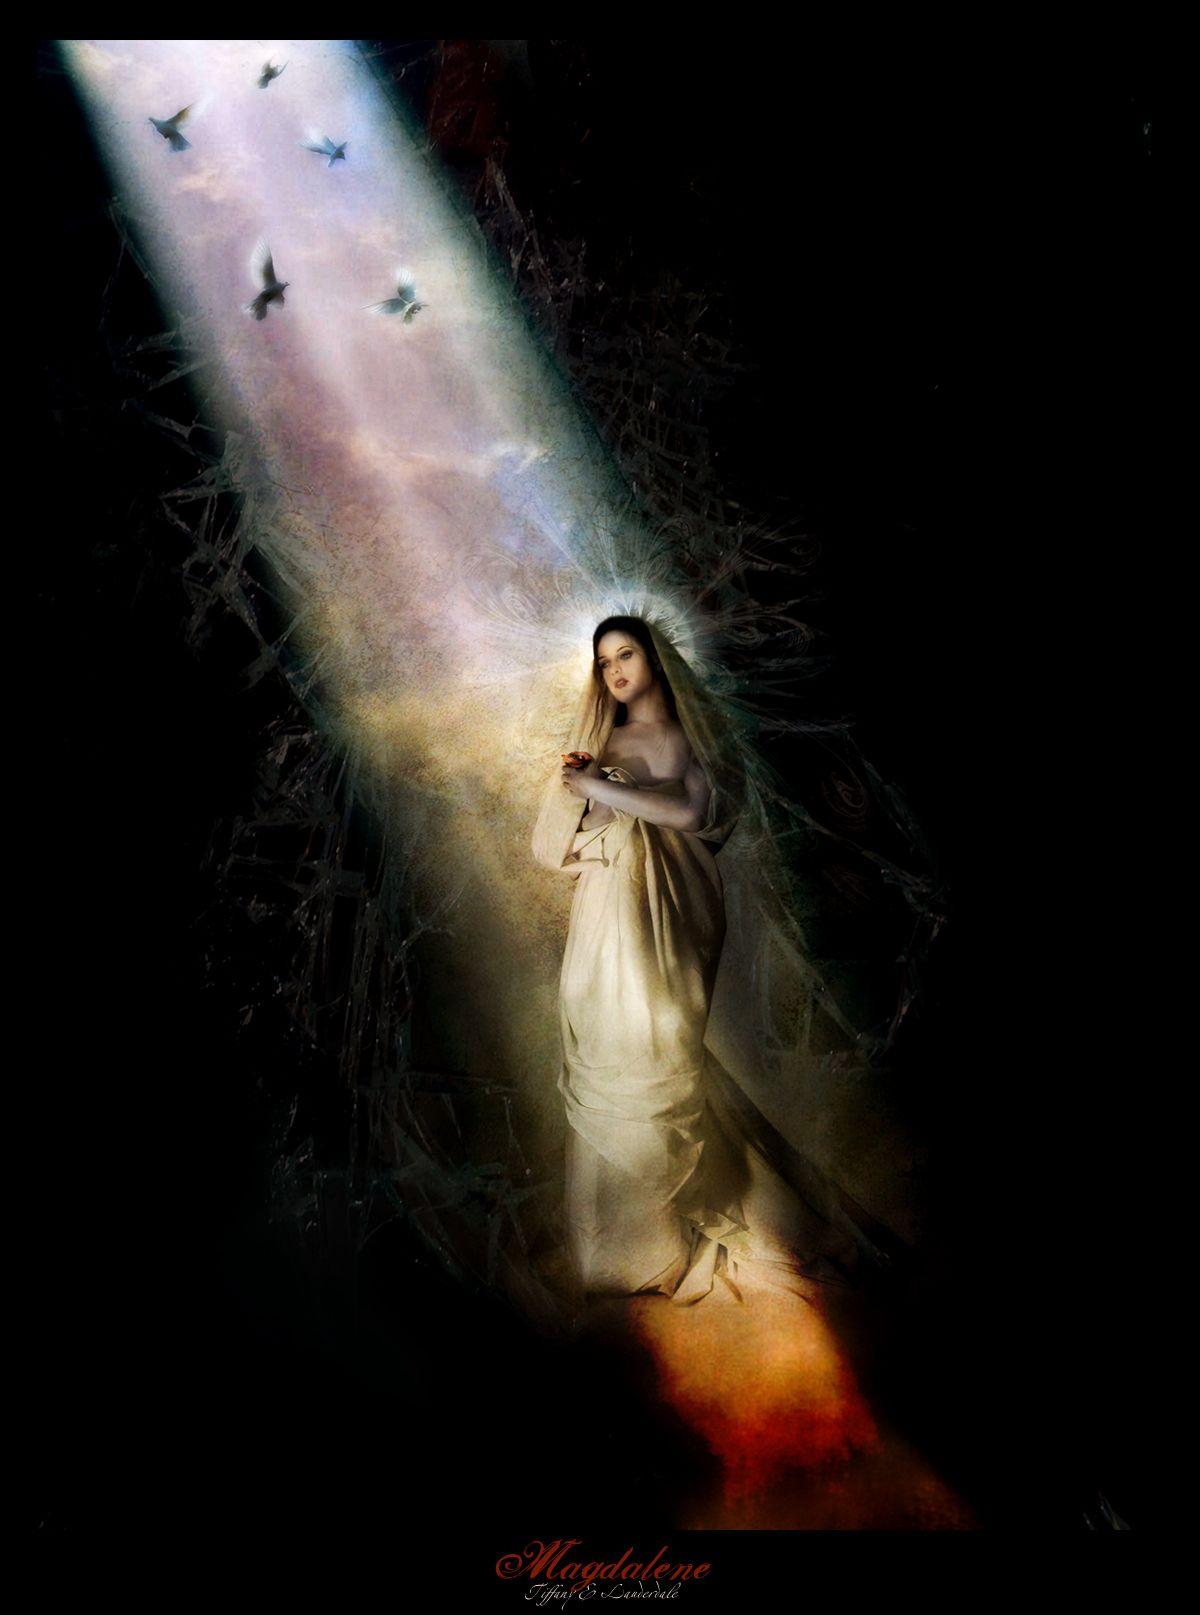 Magdalene by Solemn-Hypnotic on deviantART